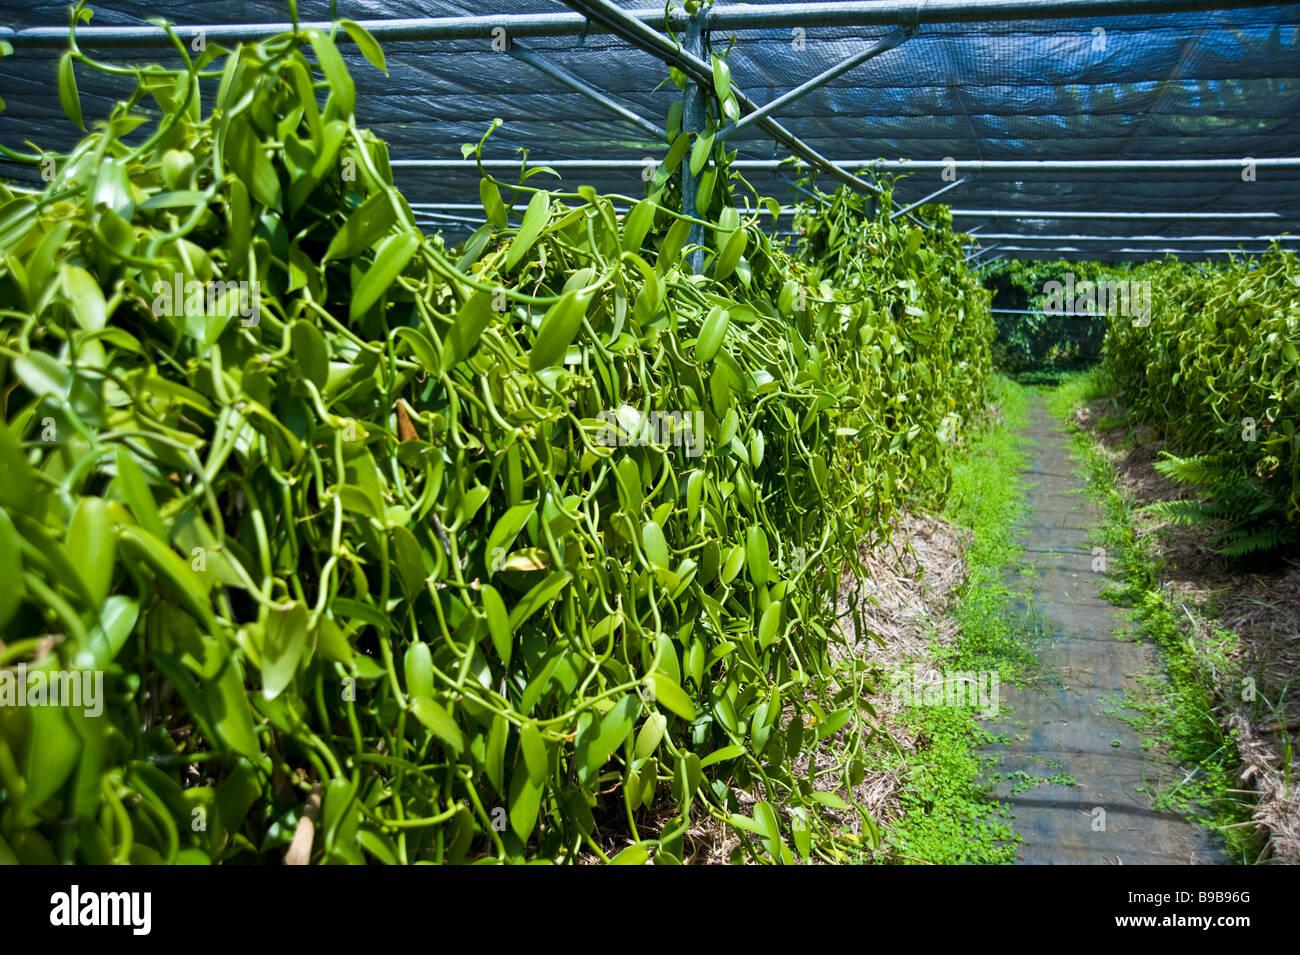 Bourbon vanilla beans on plant at vanilla farm La Réunion France | Vanille Schoten am Strauch Pflanze Stock Photo